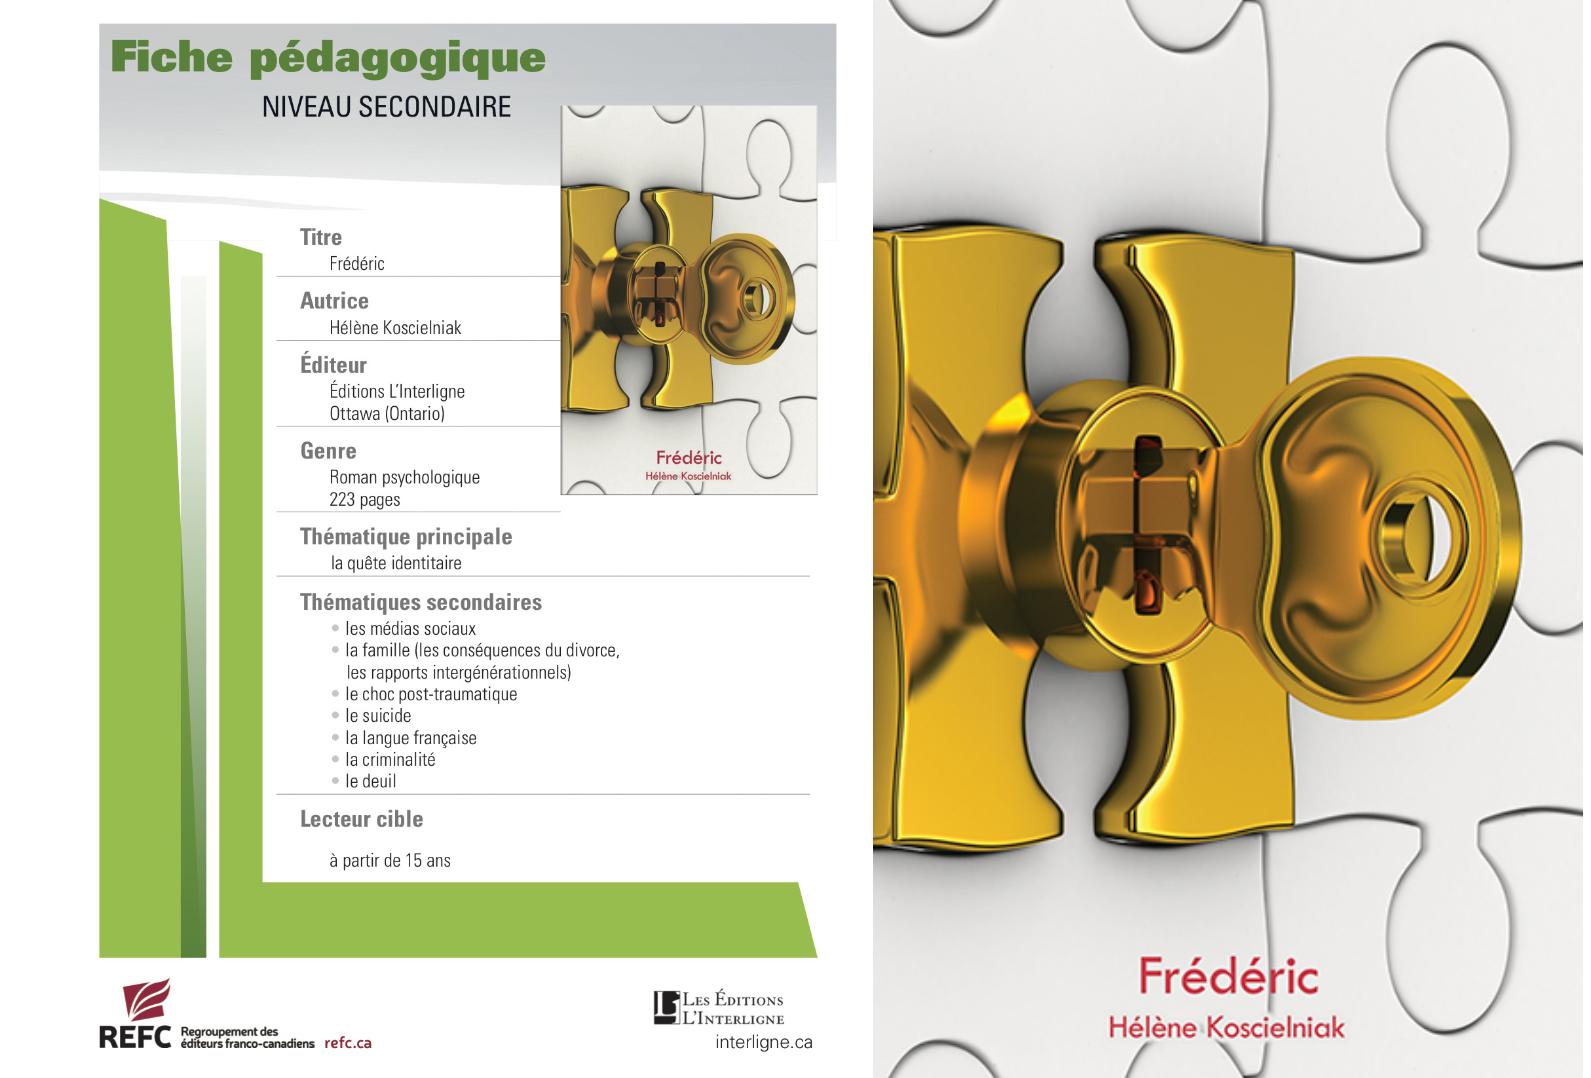 Visuel_RECF_FP_Interligne_Frederic